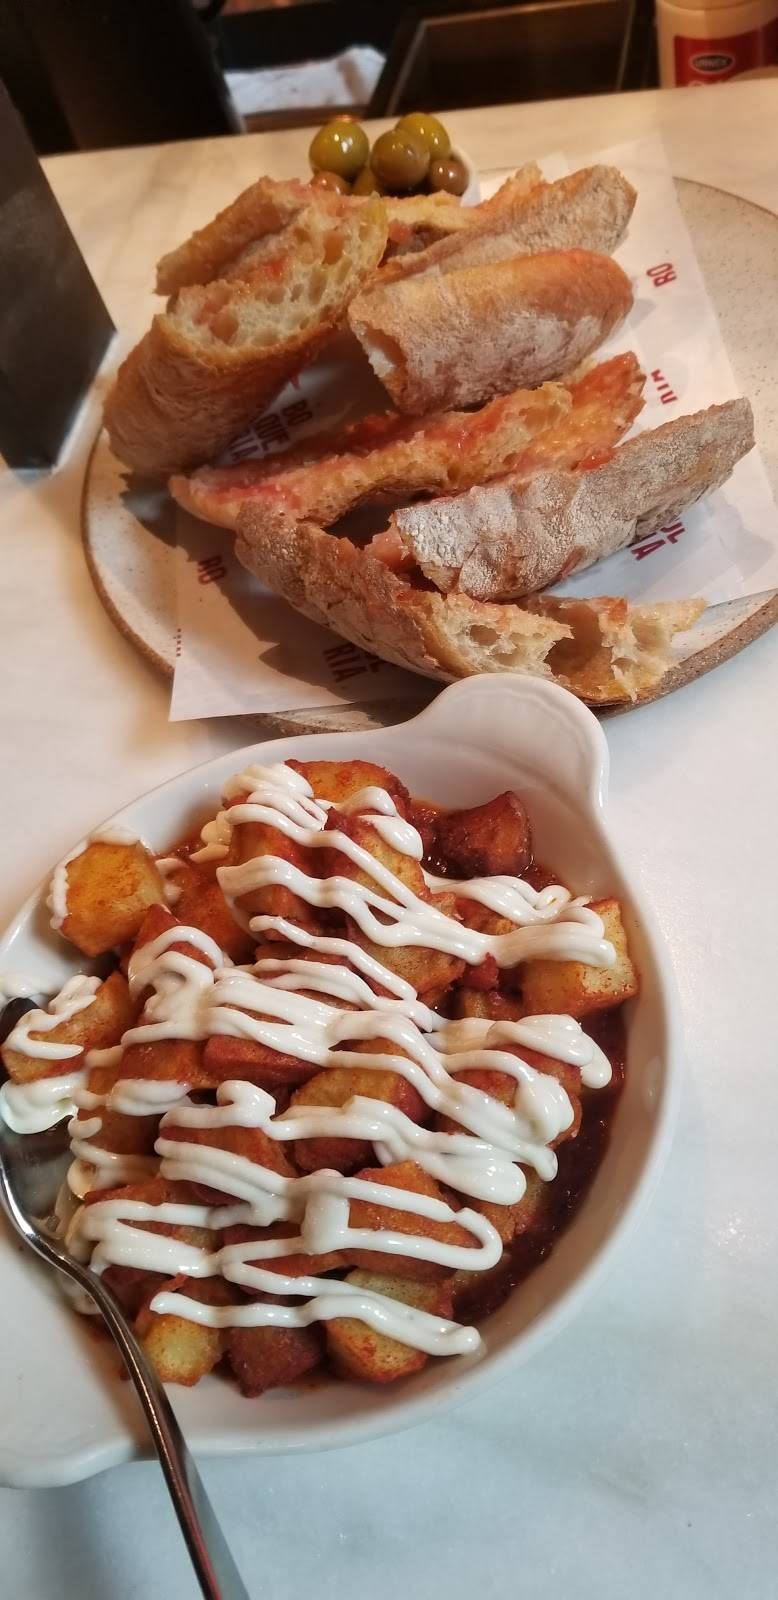 Boqueria   restaurant   260 W 40th St, New York, NY 10018, USA   2122556047 OR +1 212-255-6047